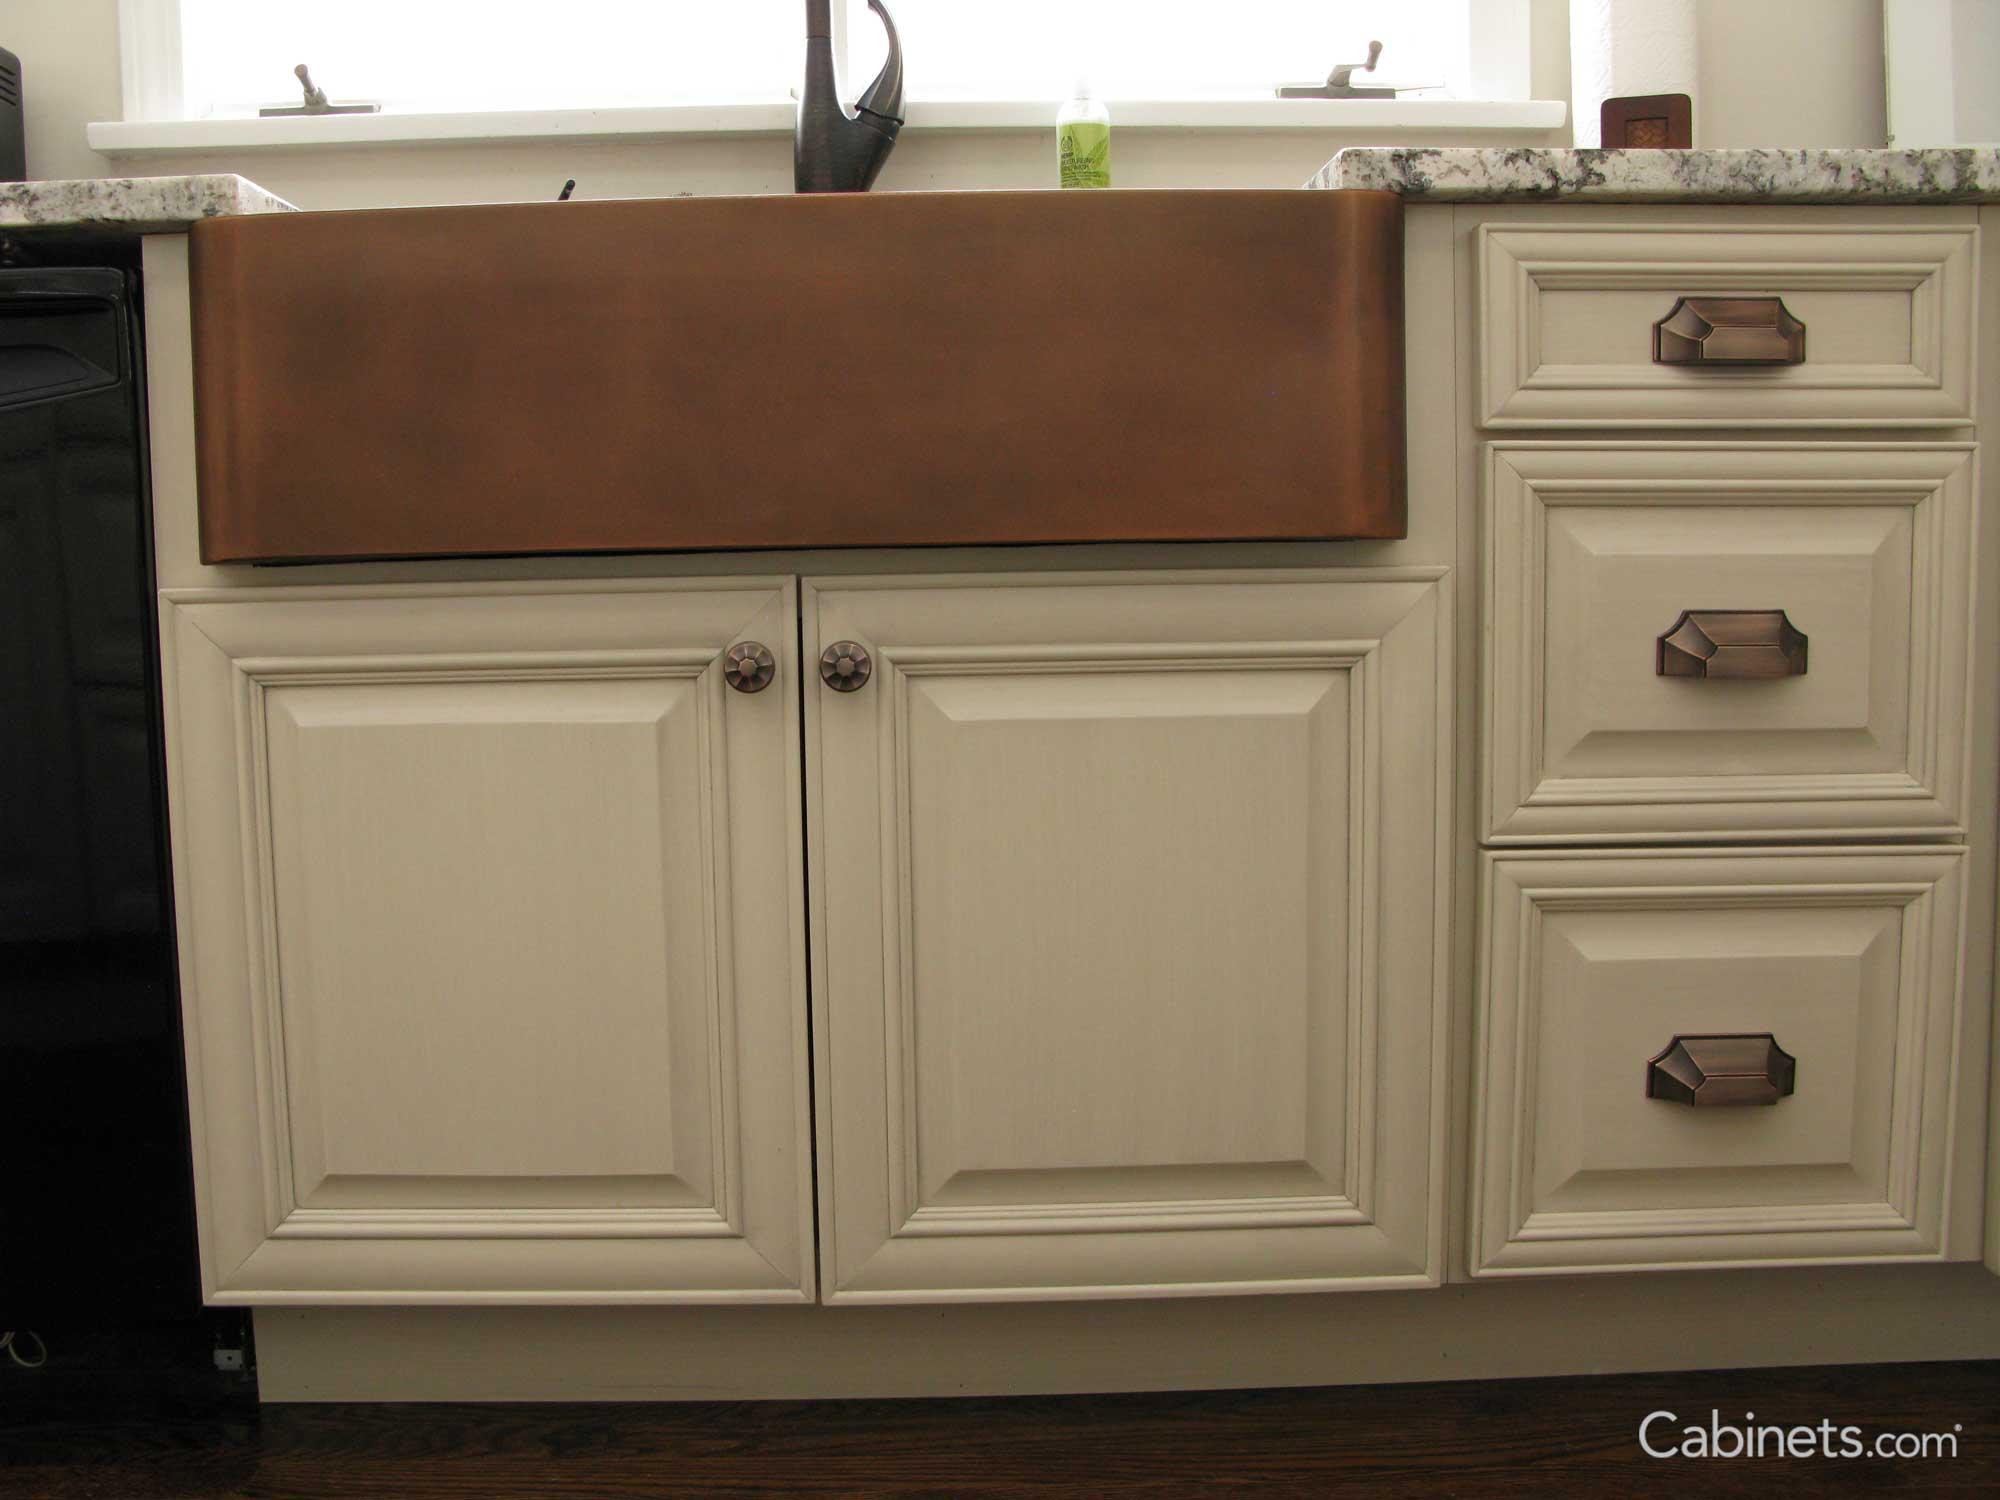 Preparing For A Farm Sink Cabinets Com